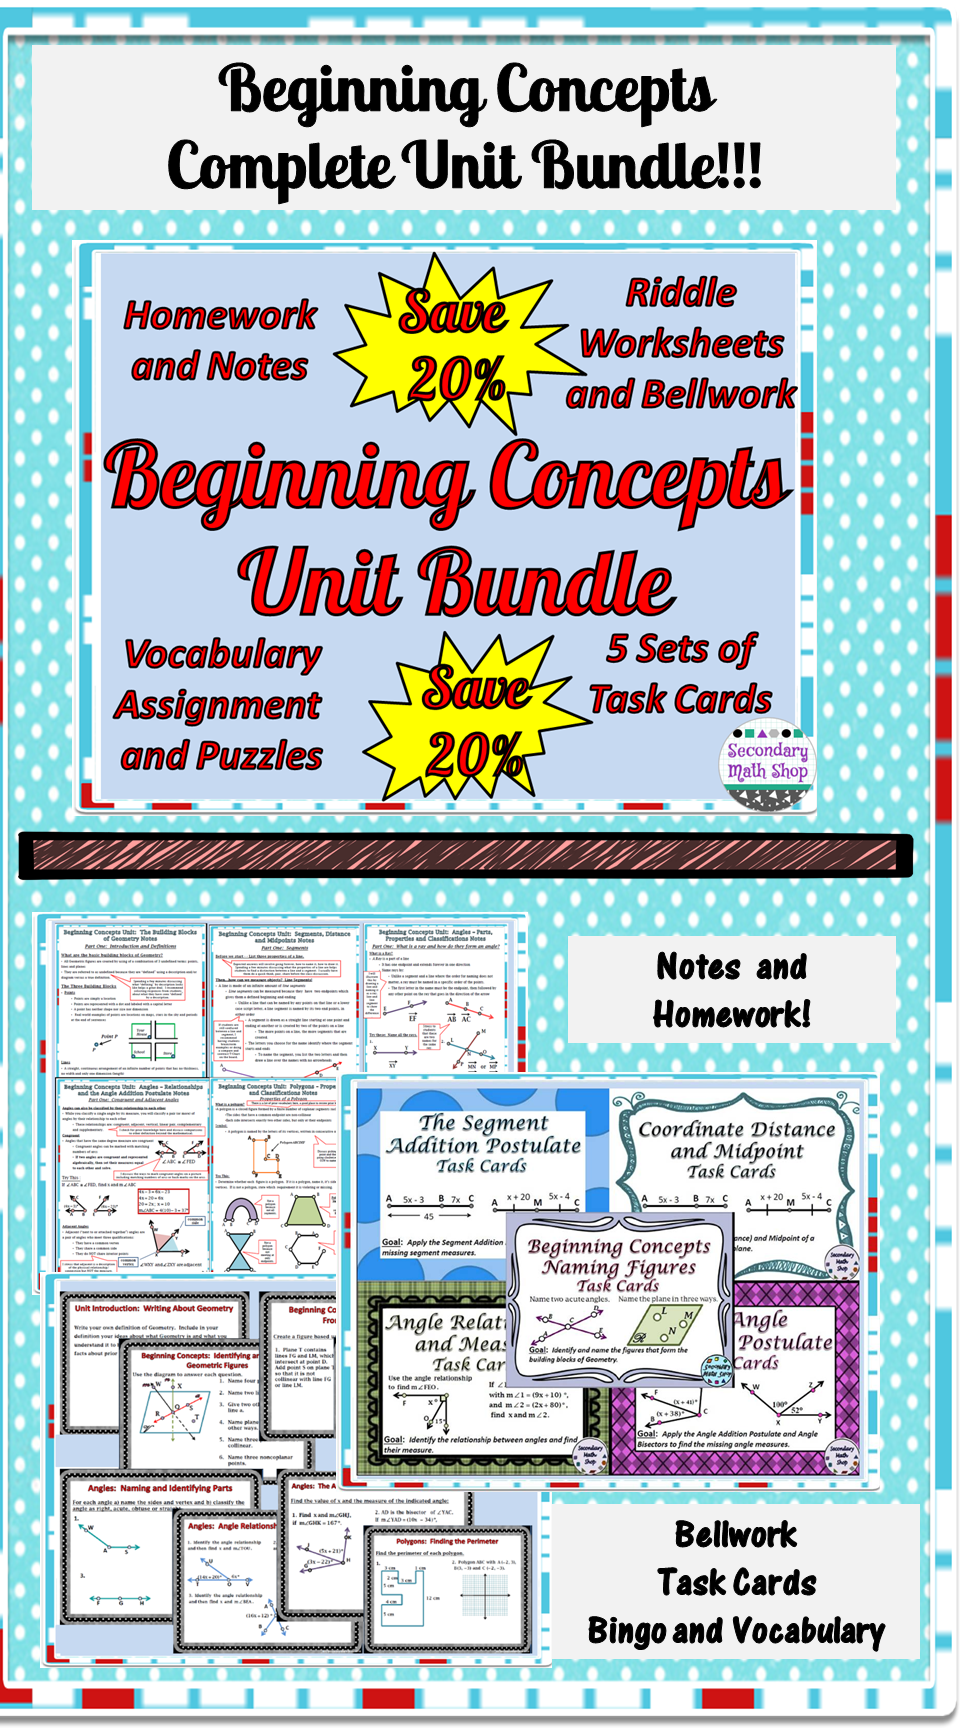 Workbooks vocabulary building worksheets high school : Beginning Concepts - Unit 1: Building Block of Geometry Unit ...